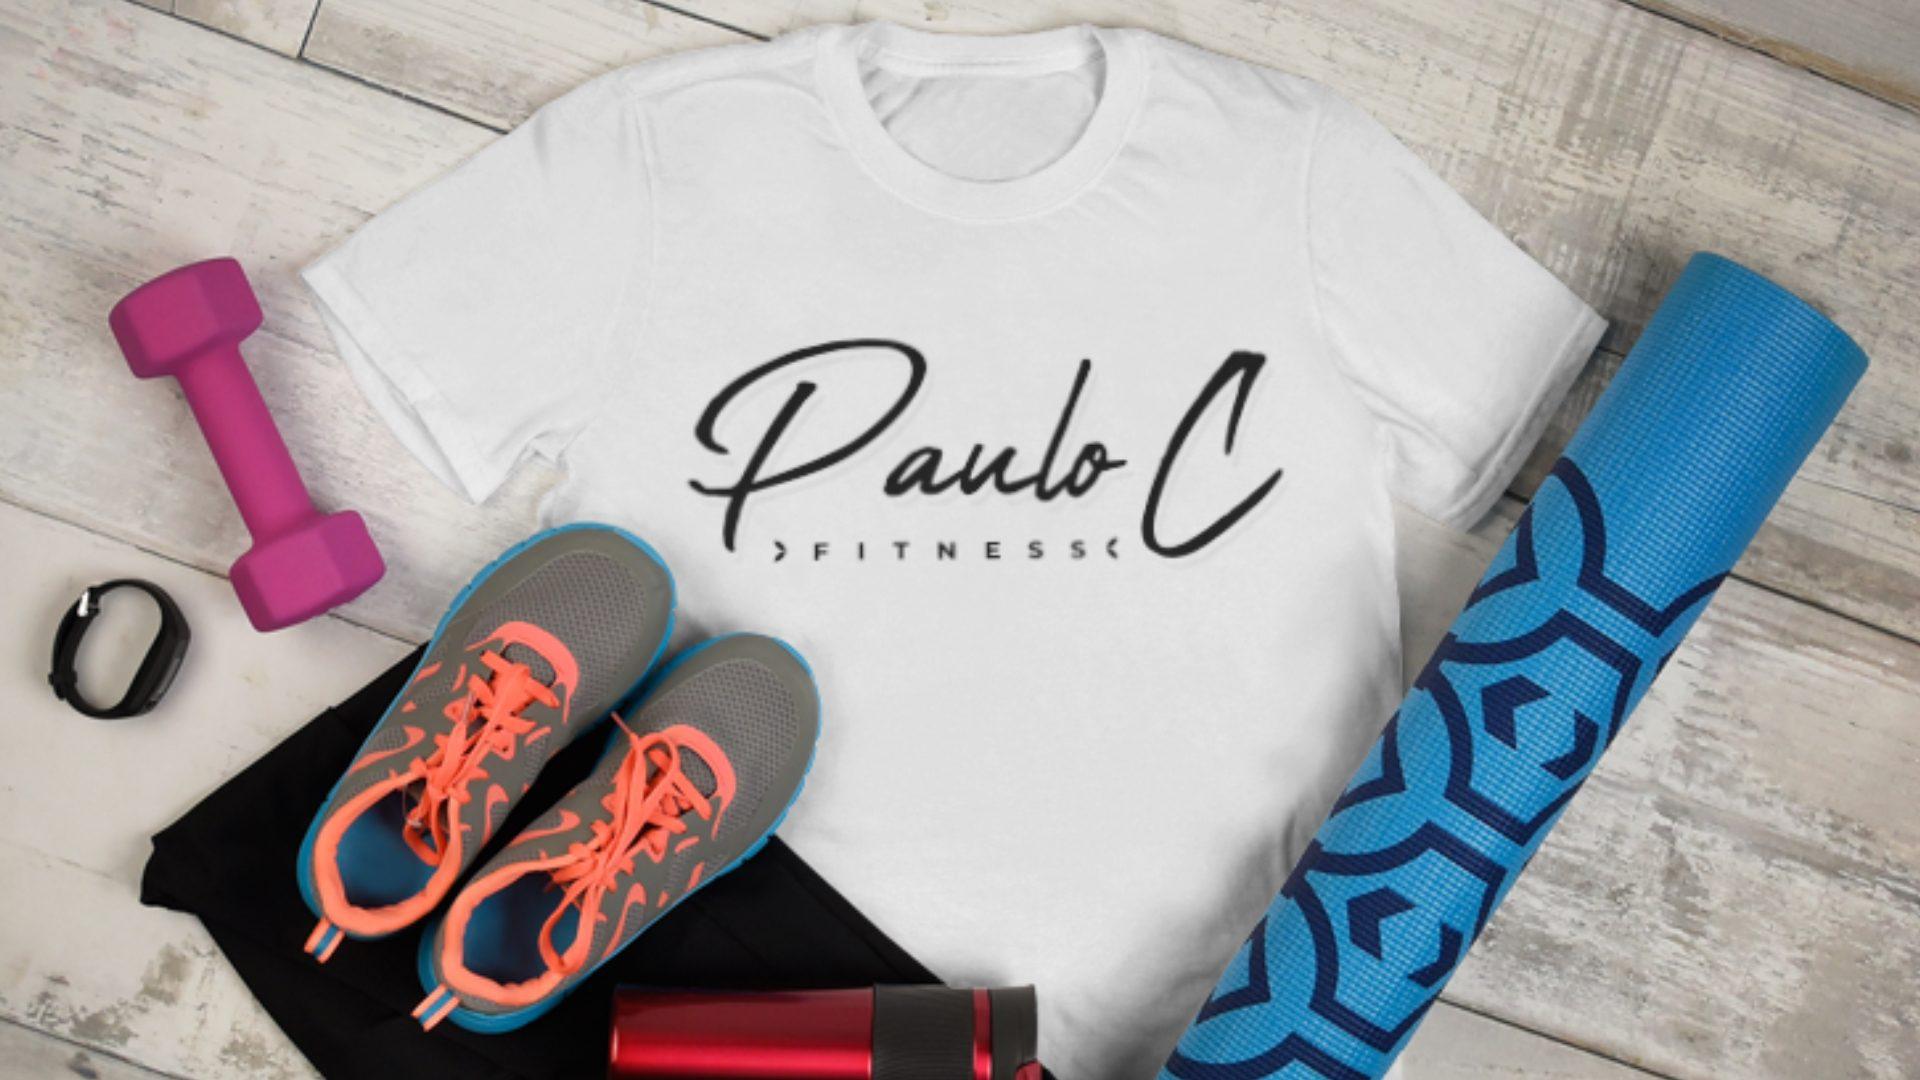 Paulo C Fitness - Logo Mockup 03